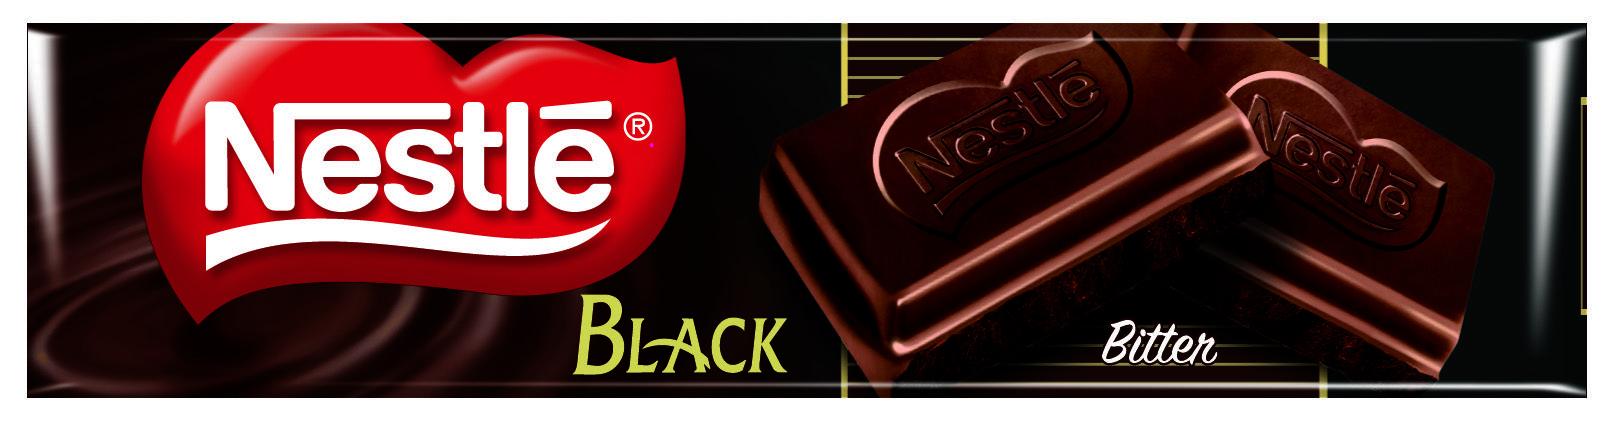 Nestlé Black Bitter Çikolata